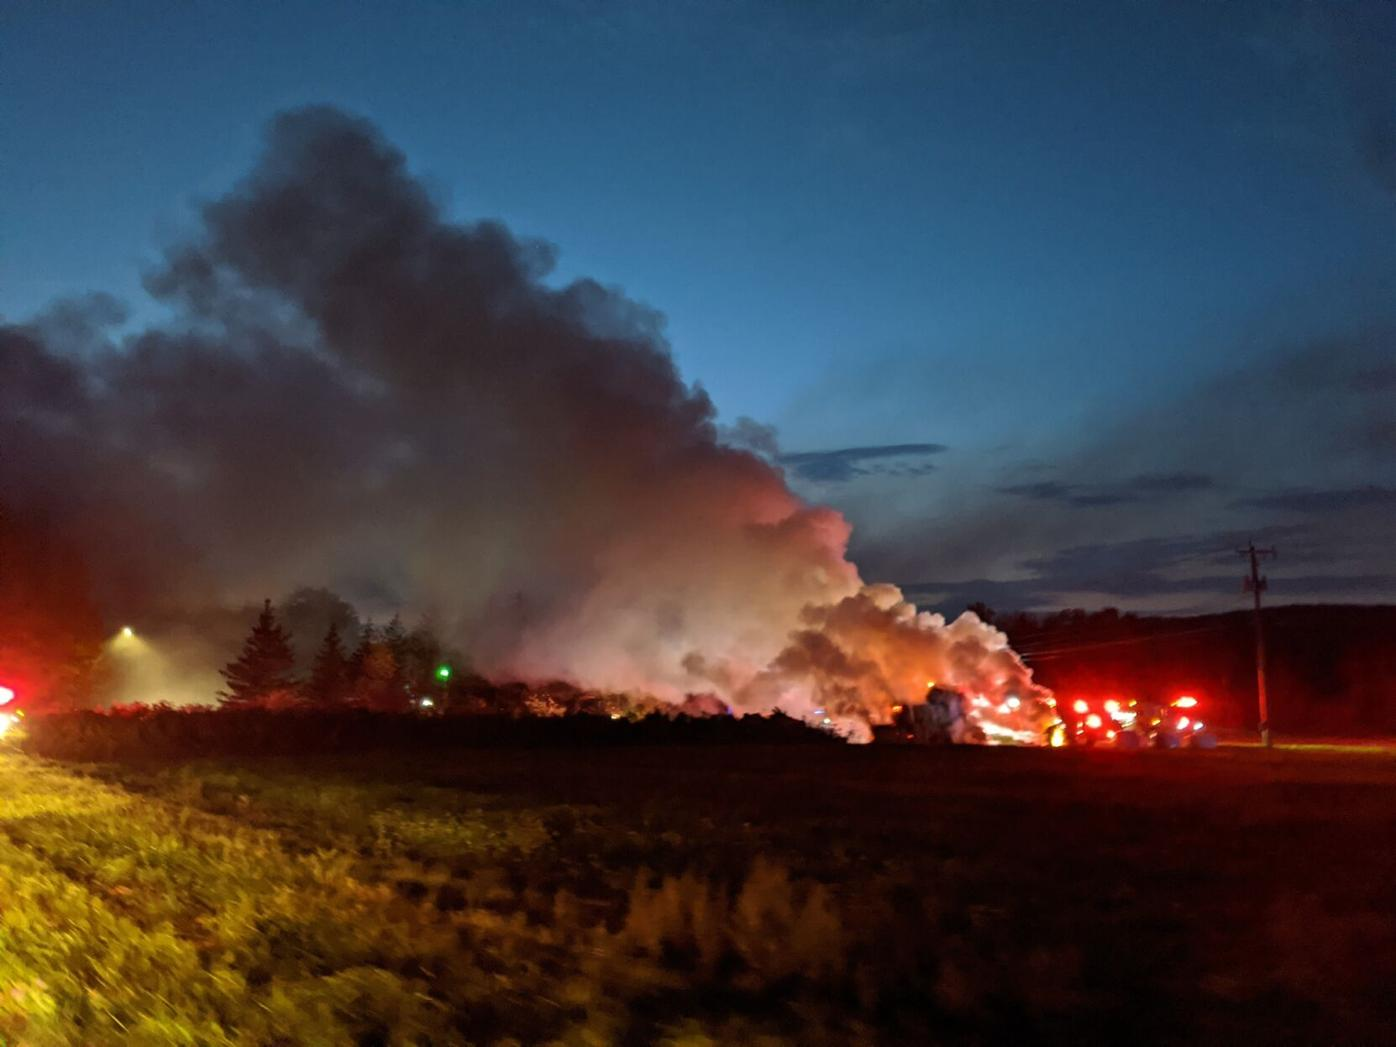 Dalton farm fire 3.jpg (copy)